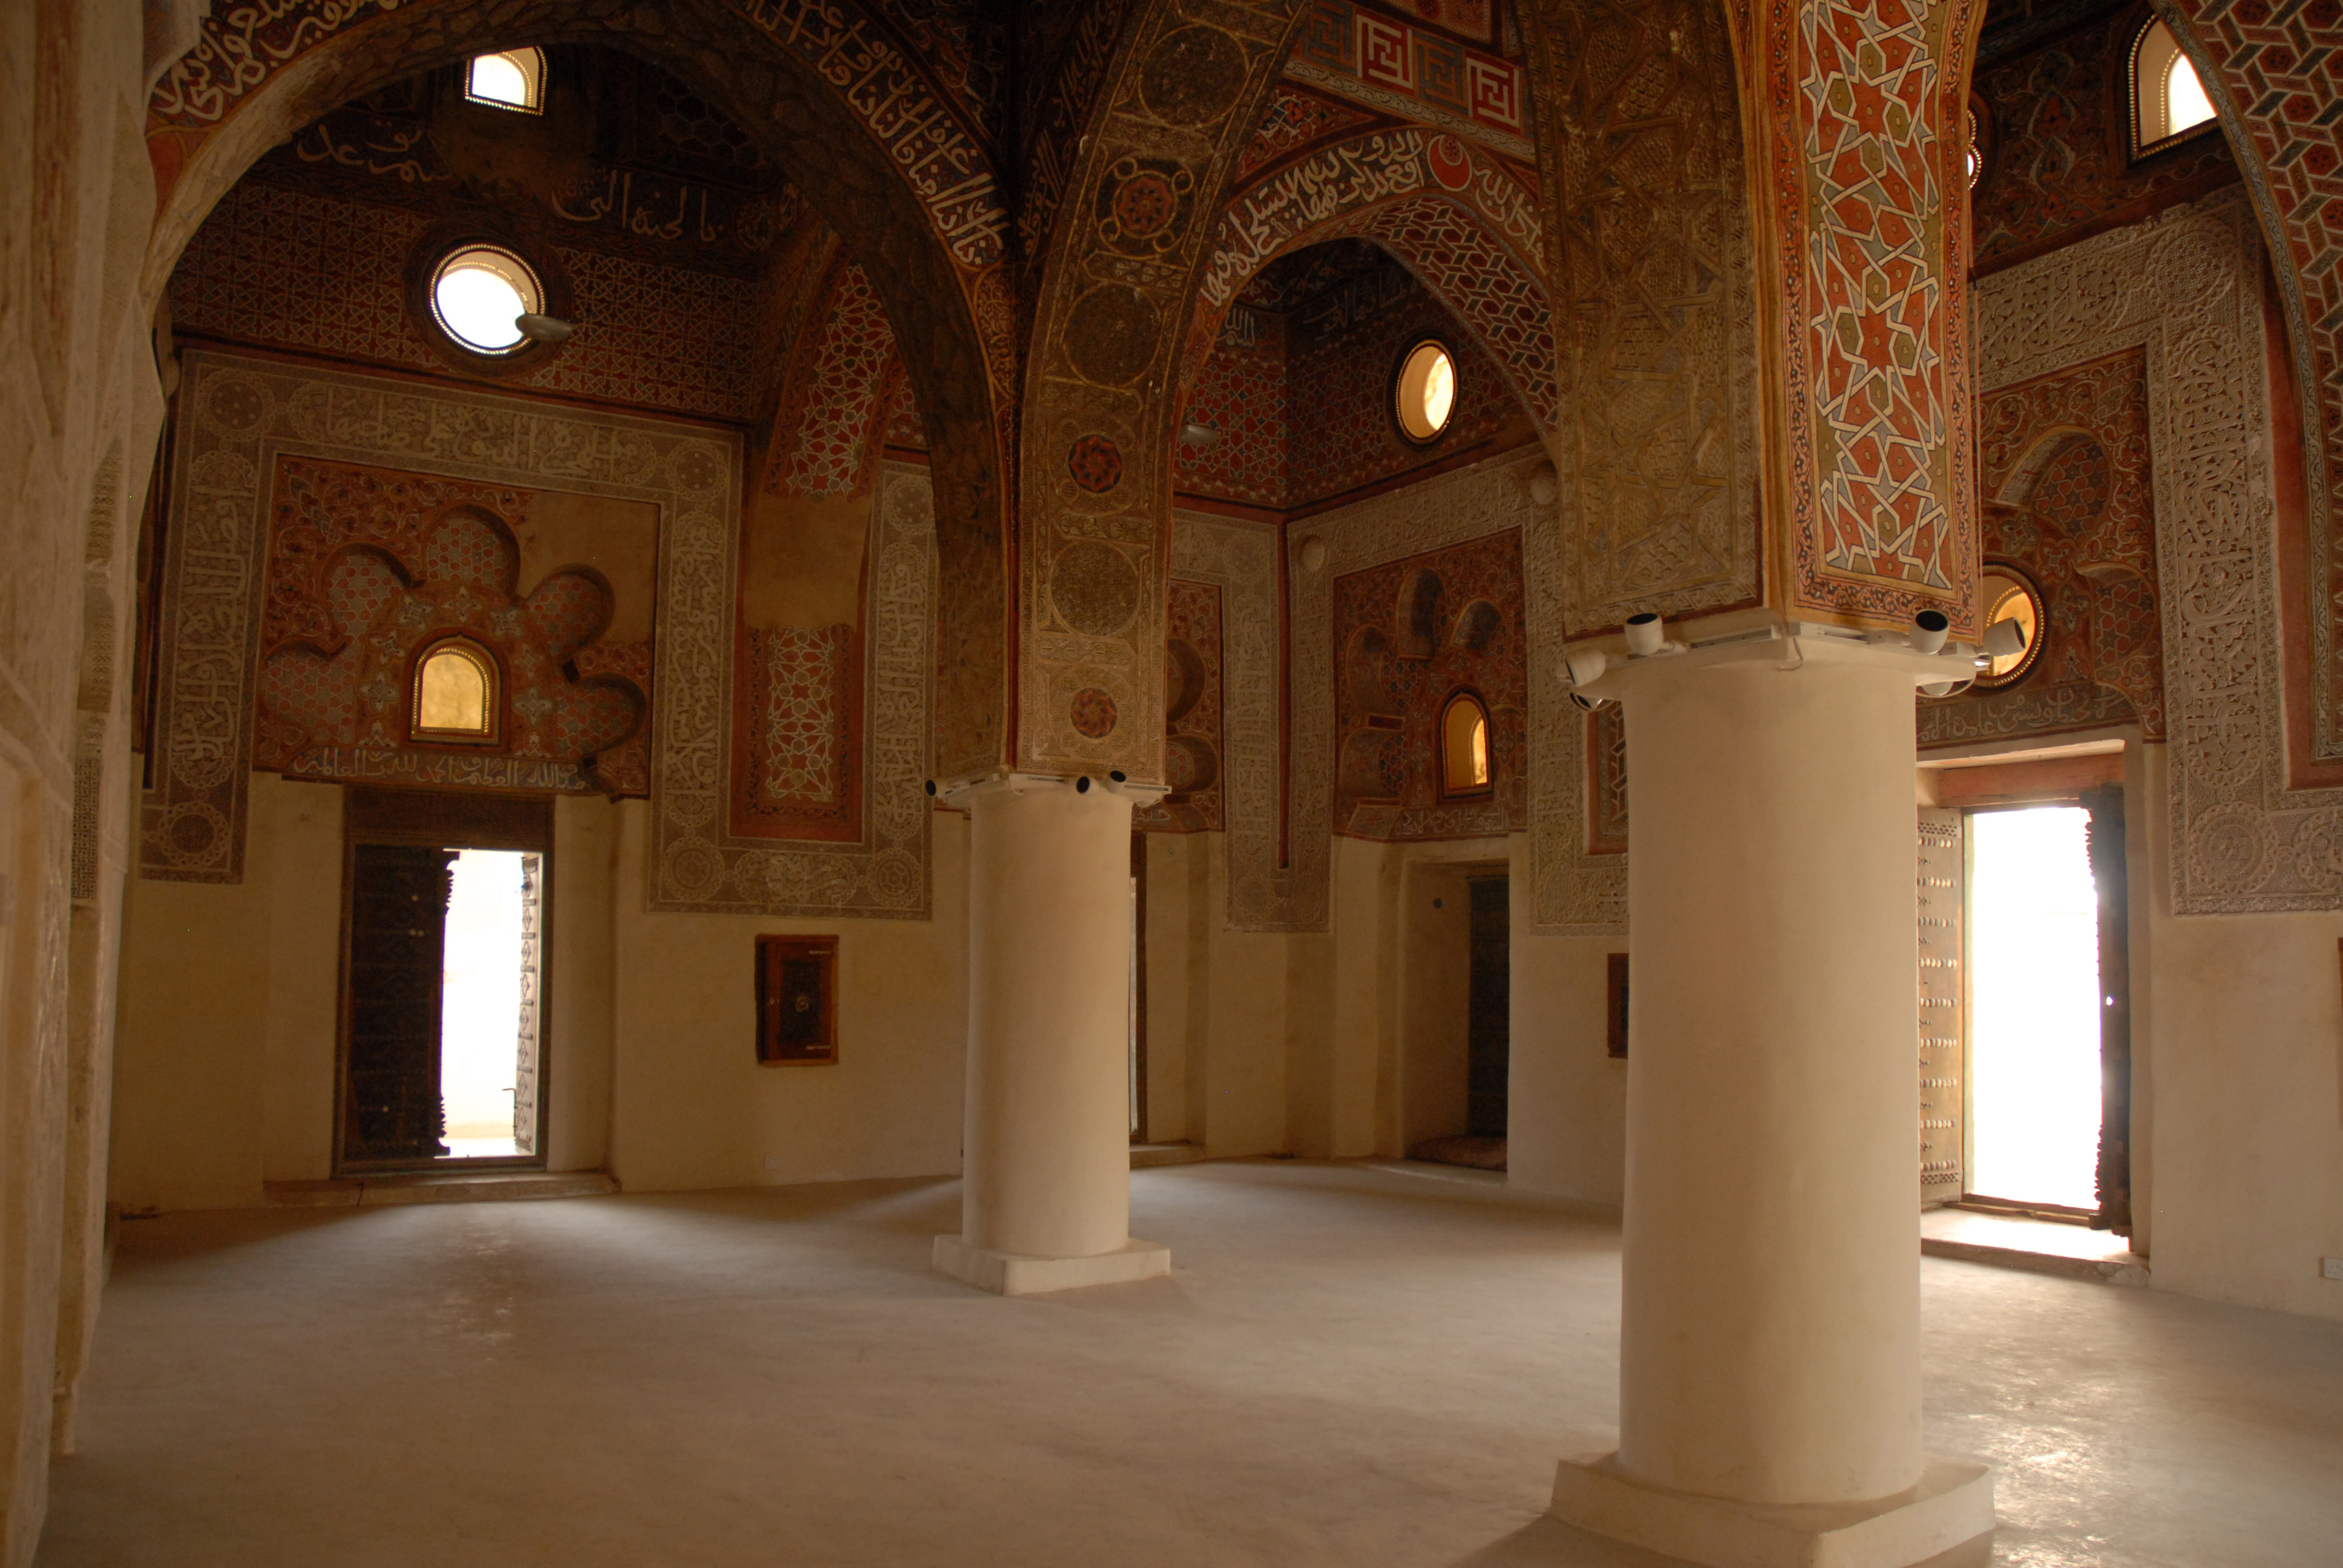 muslim art and architecture - HD3872×2592